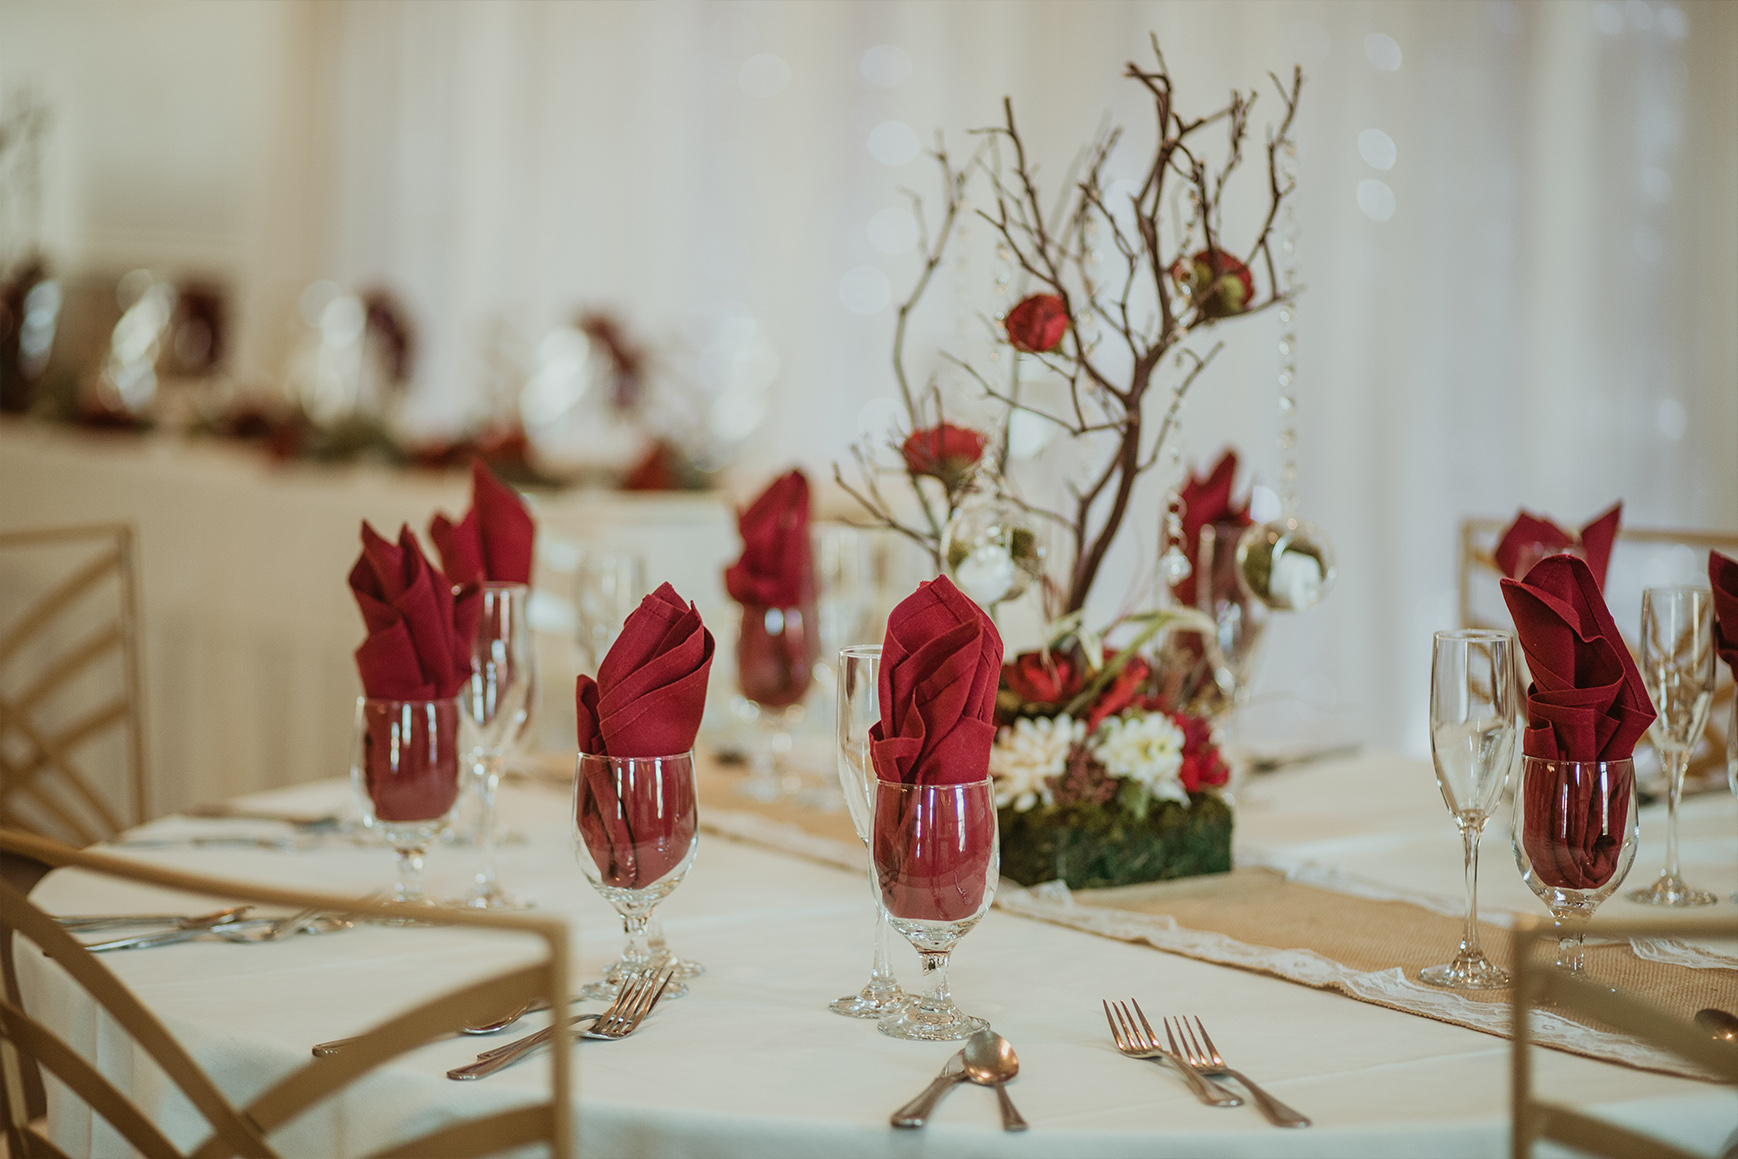 Festive table setting - Fresno - Fresno, California - Frenso County - Wedgewood Weddngs